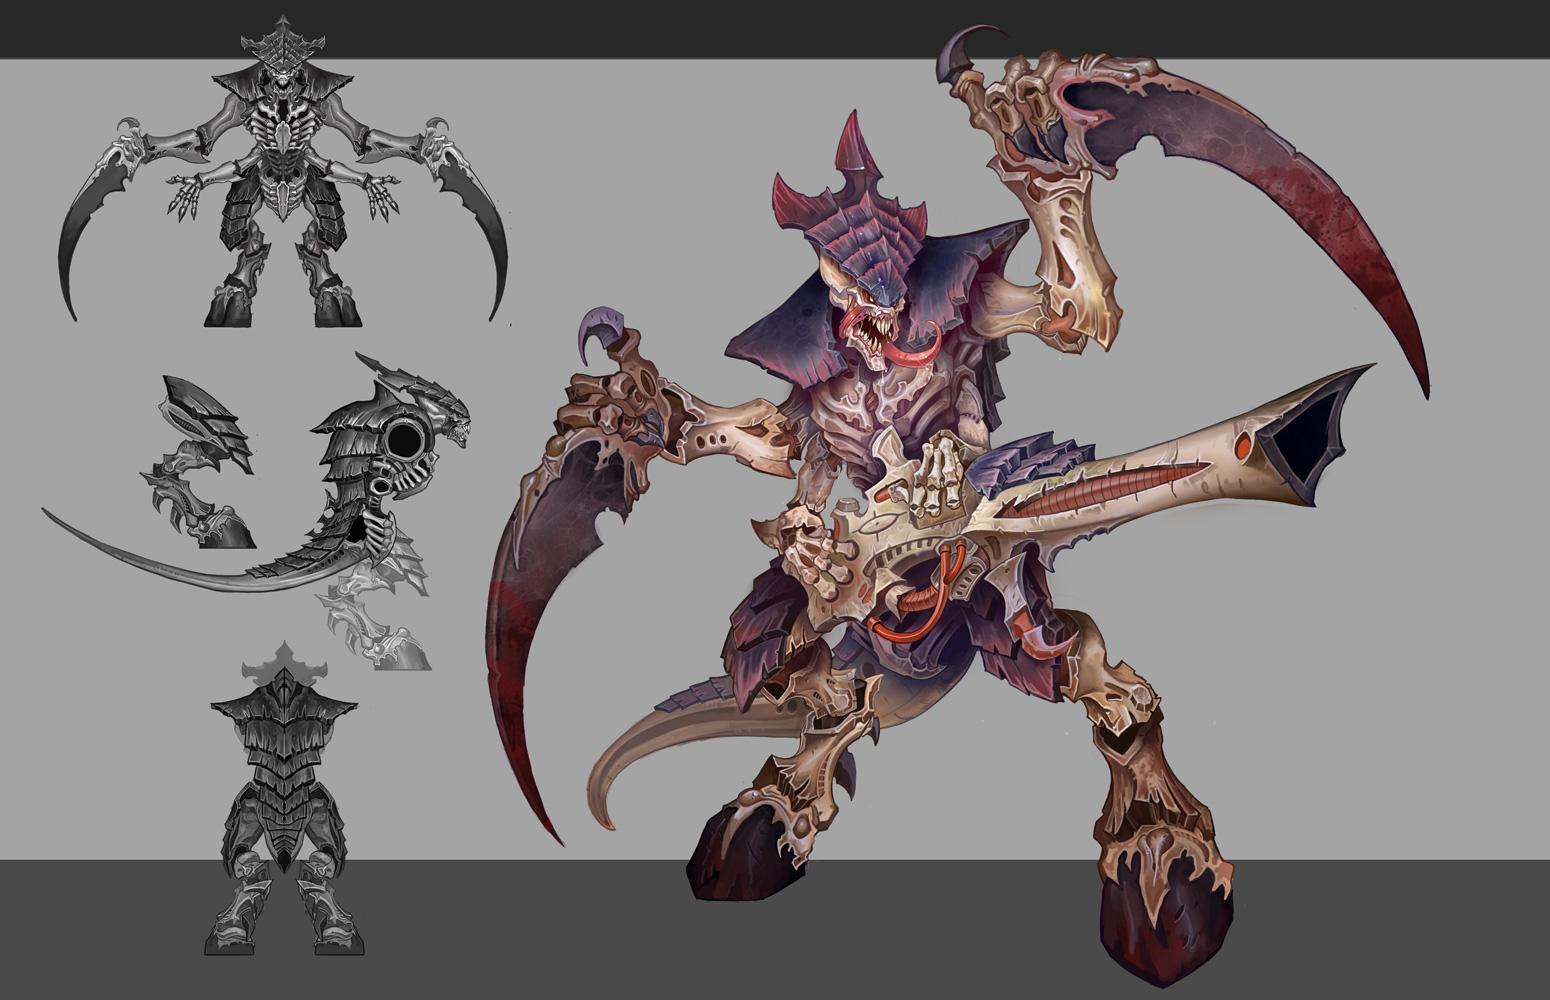 [E3] Eternal Crusade, un MMO Warhammer 40K - Page 3 31